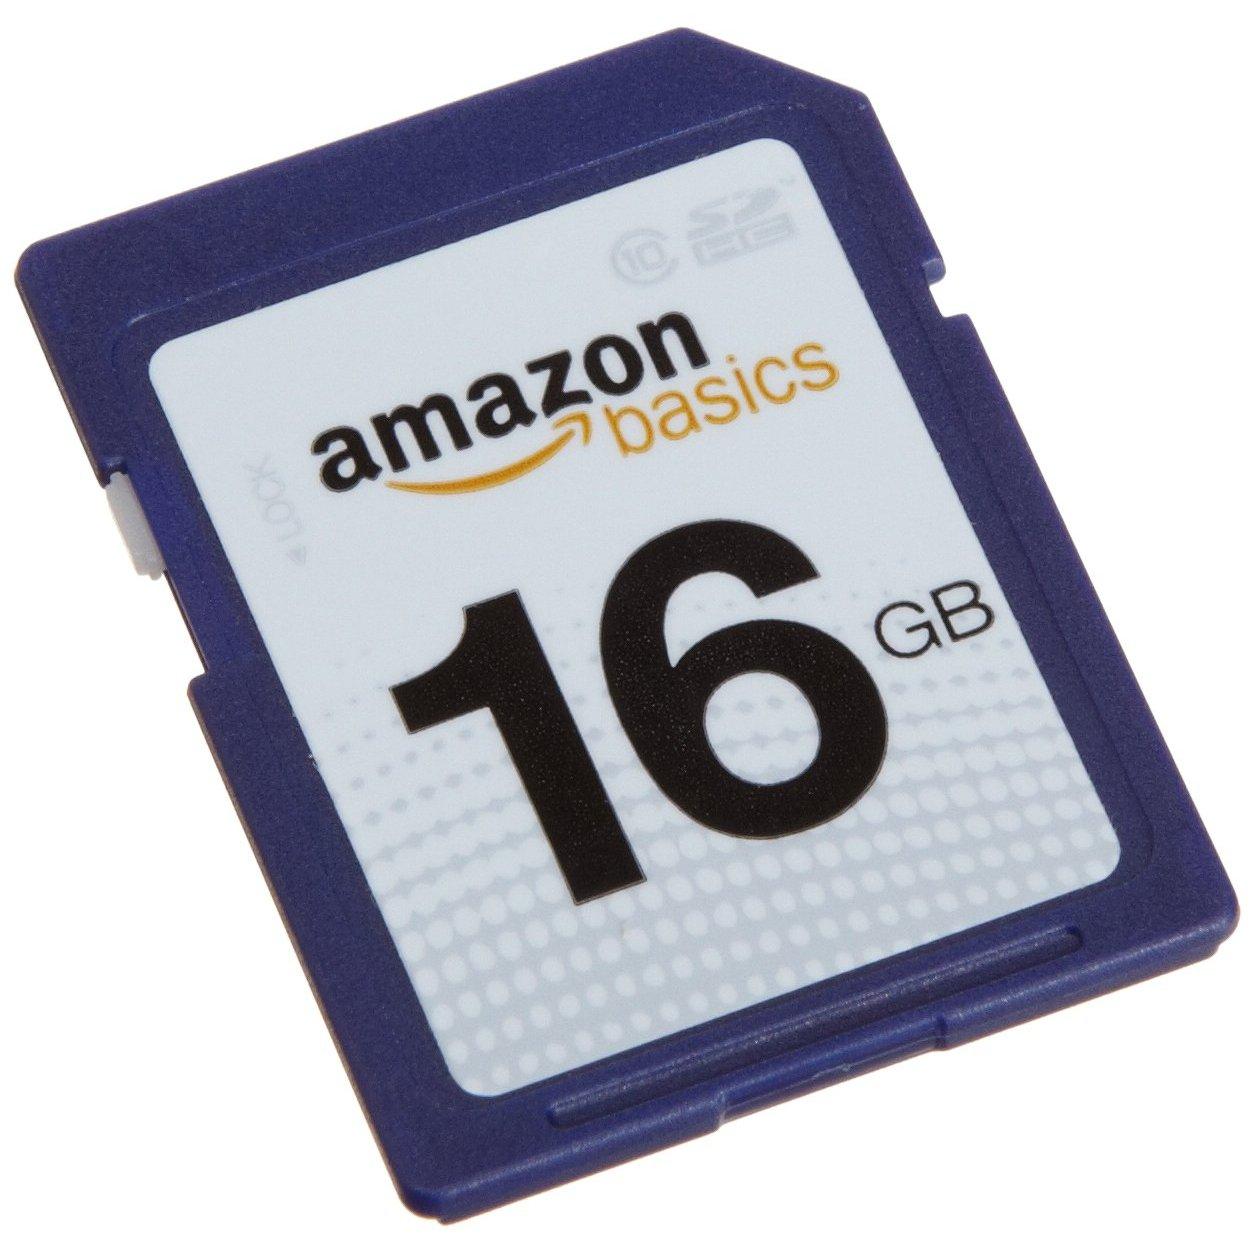 https://thetechjournal.com/wp-content/uploads/images/1109/1317180381-amazonbasics-16-gb-class-10-sdhc-flash-memory-card-1.jpg